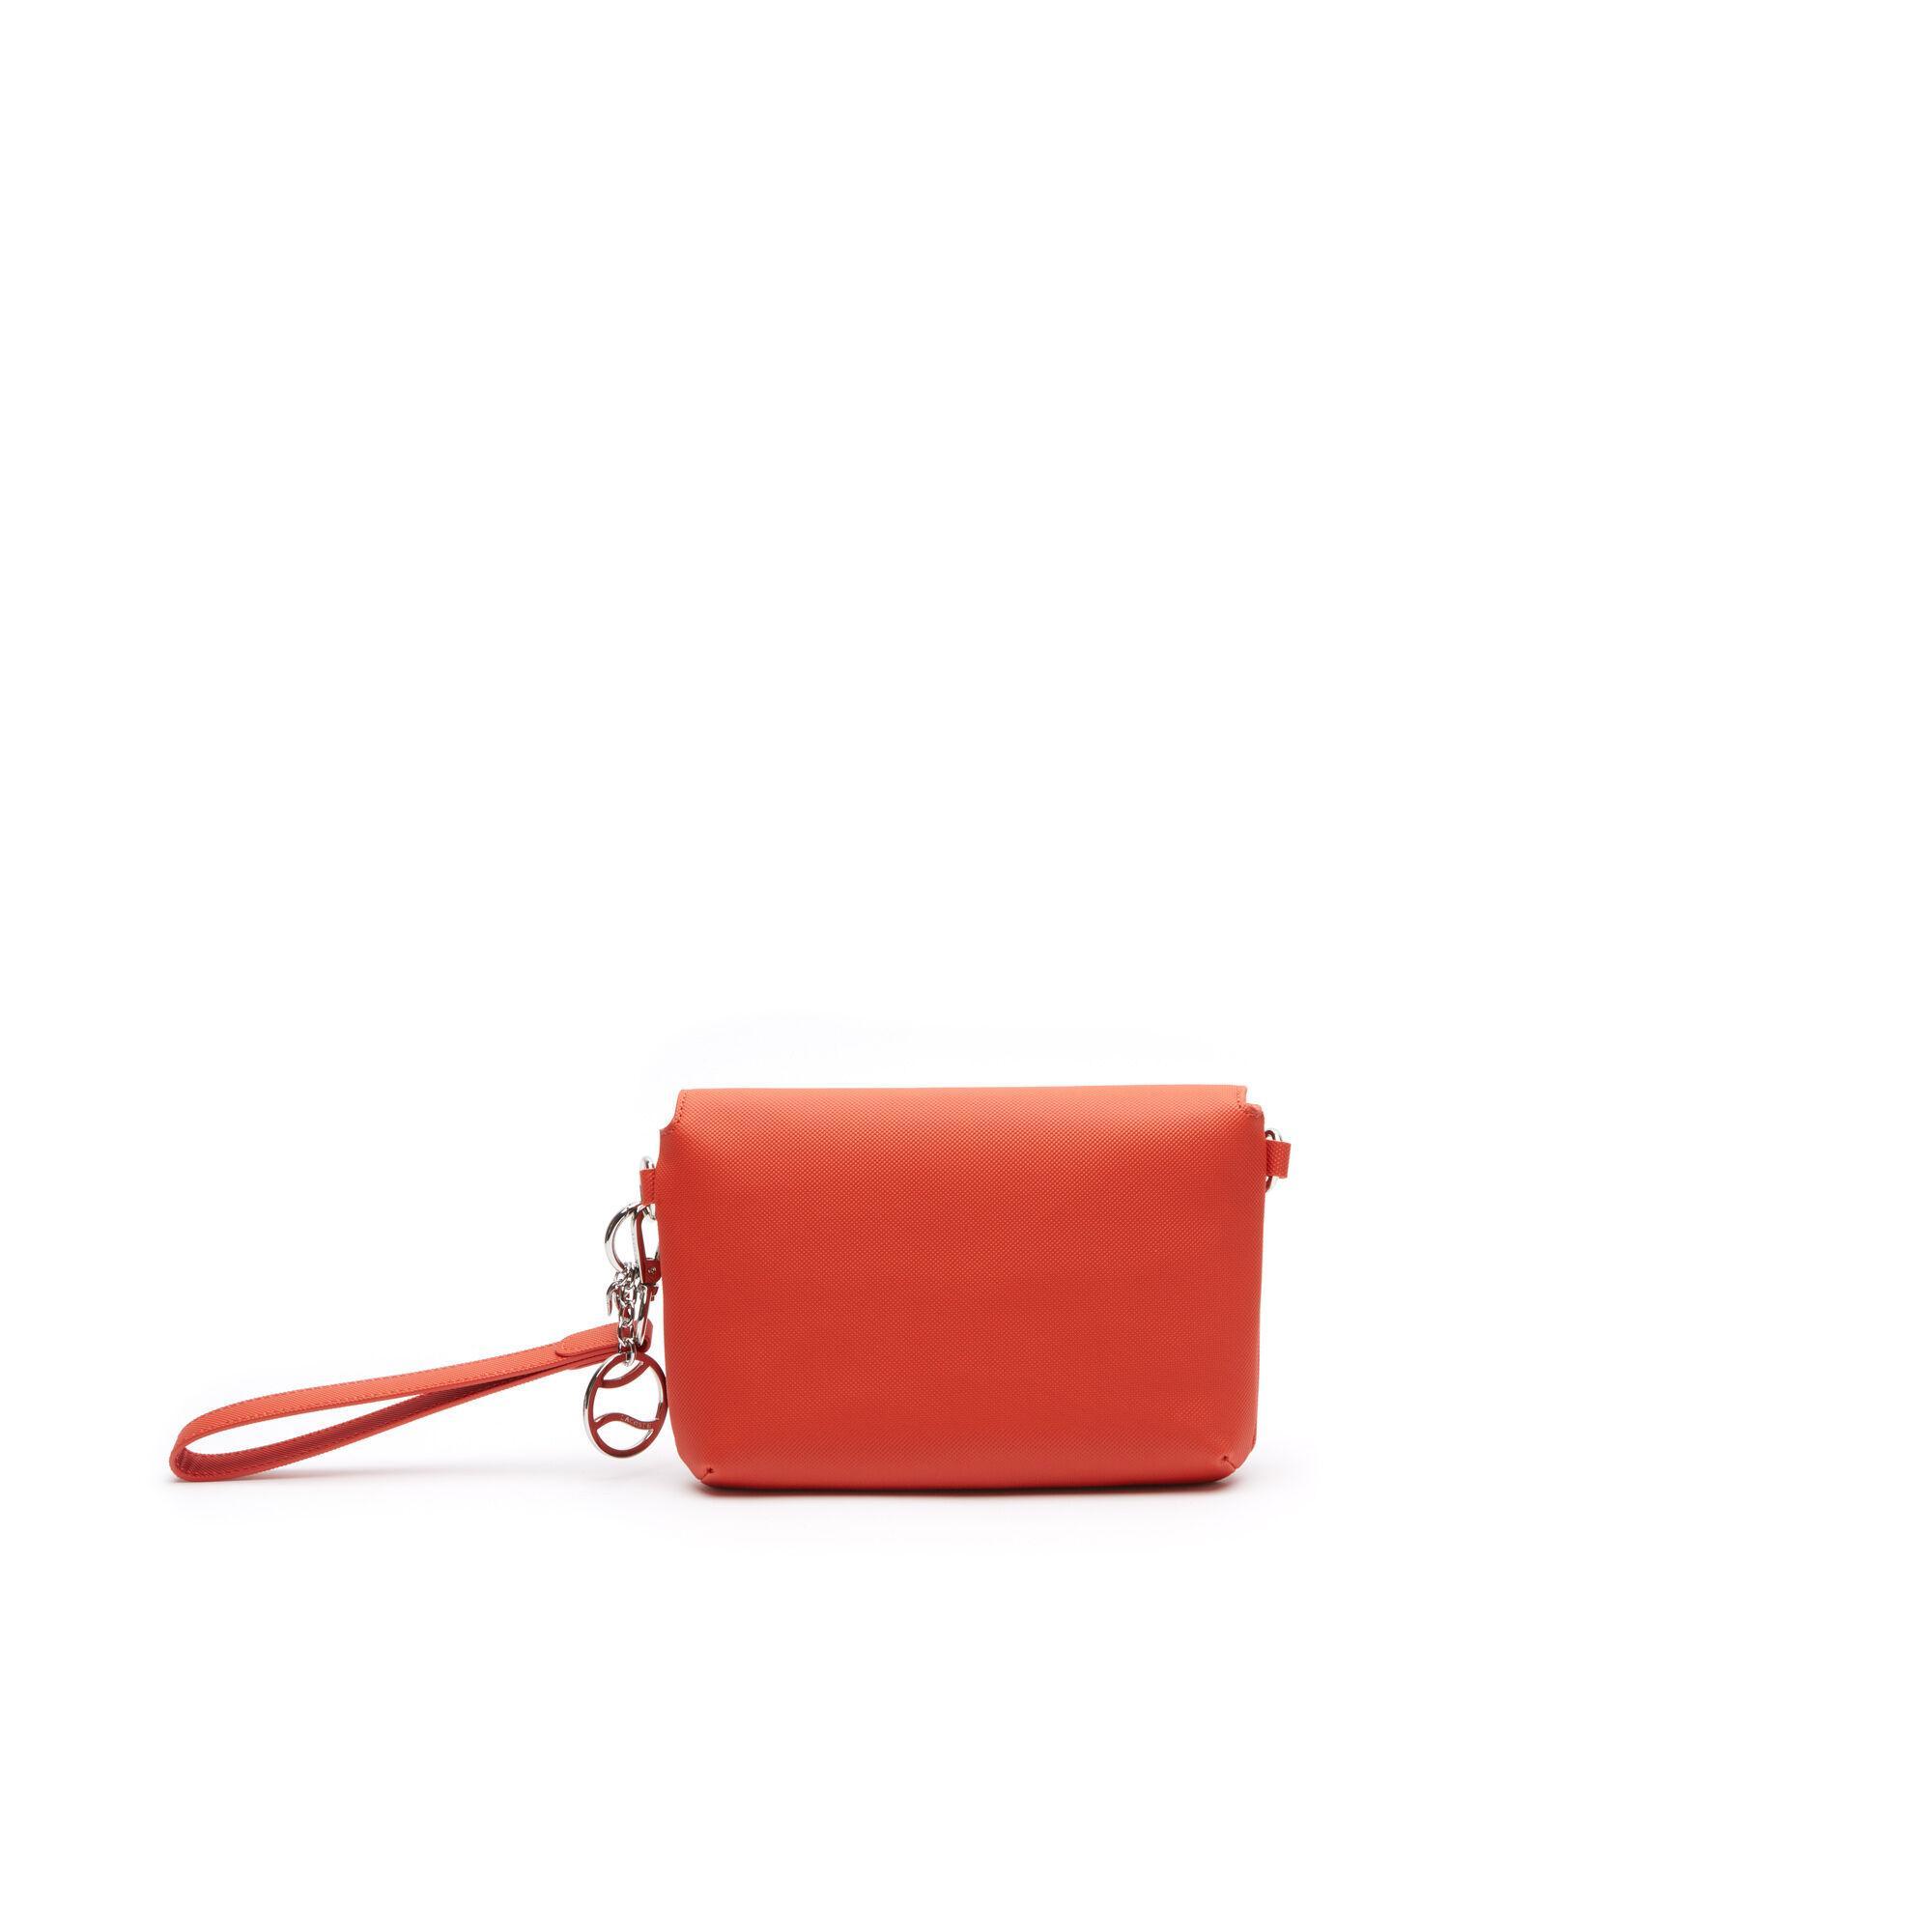 Lacoste сумка жіноча Daily Classic